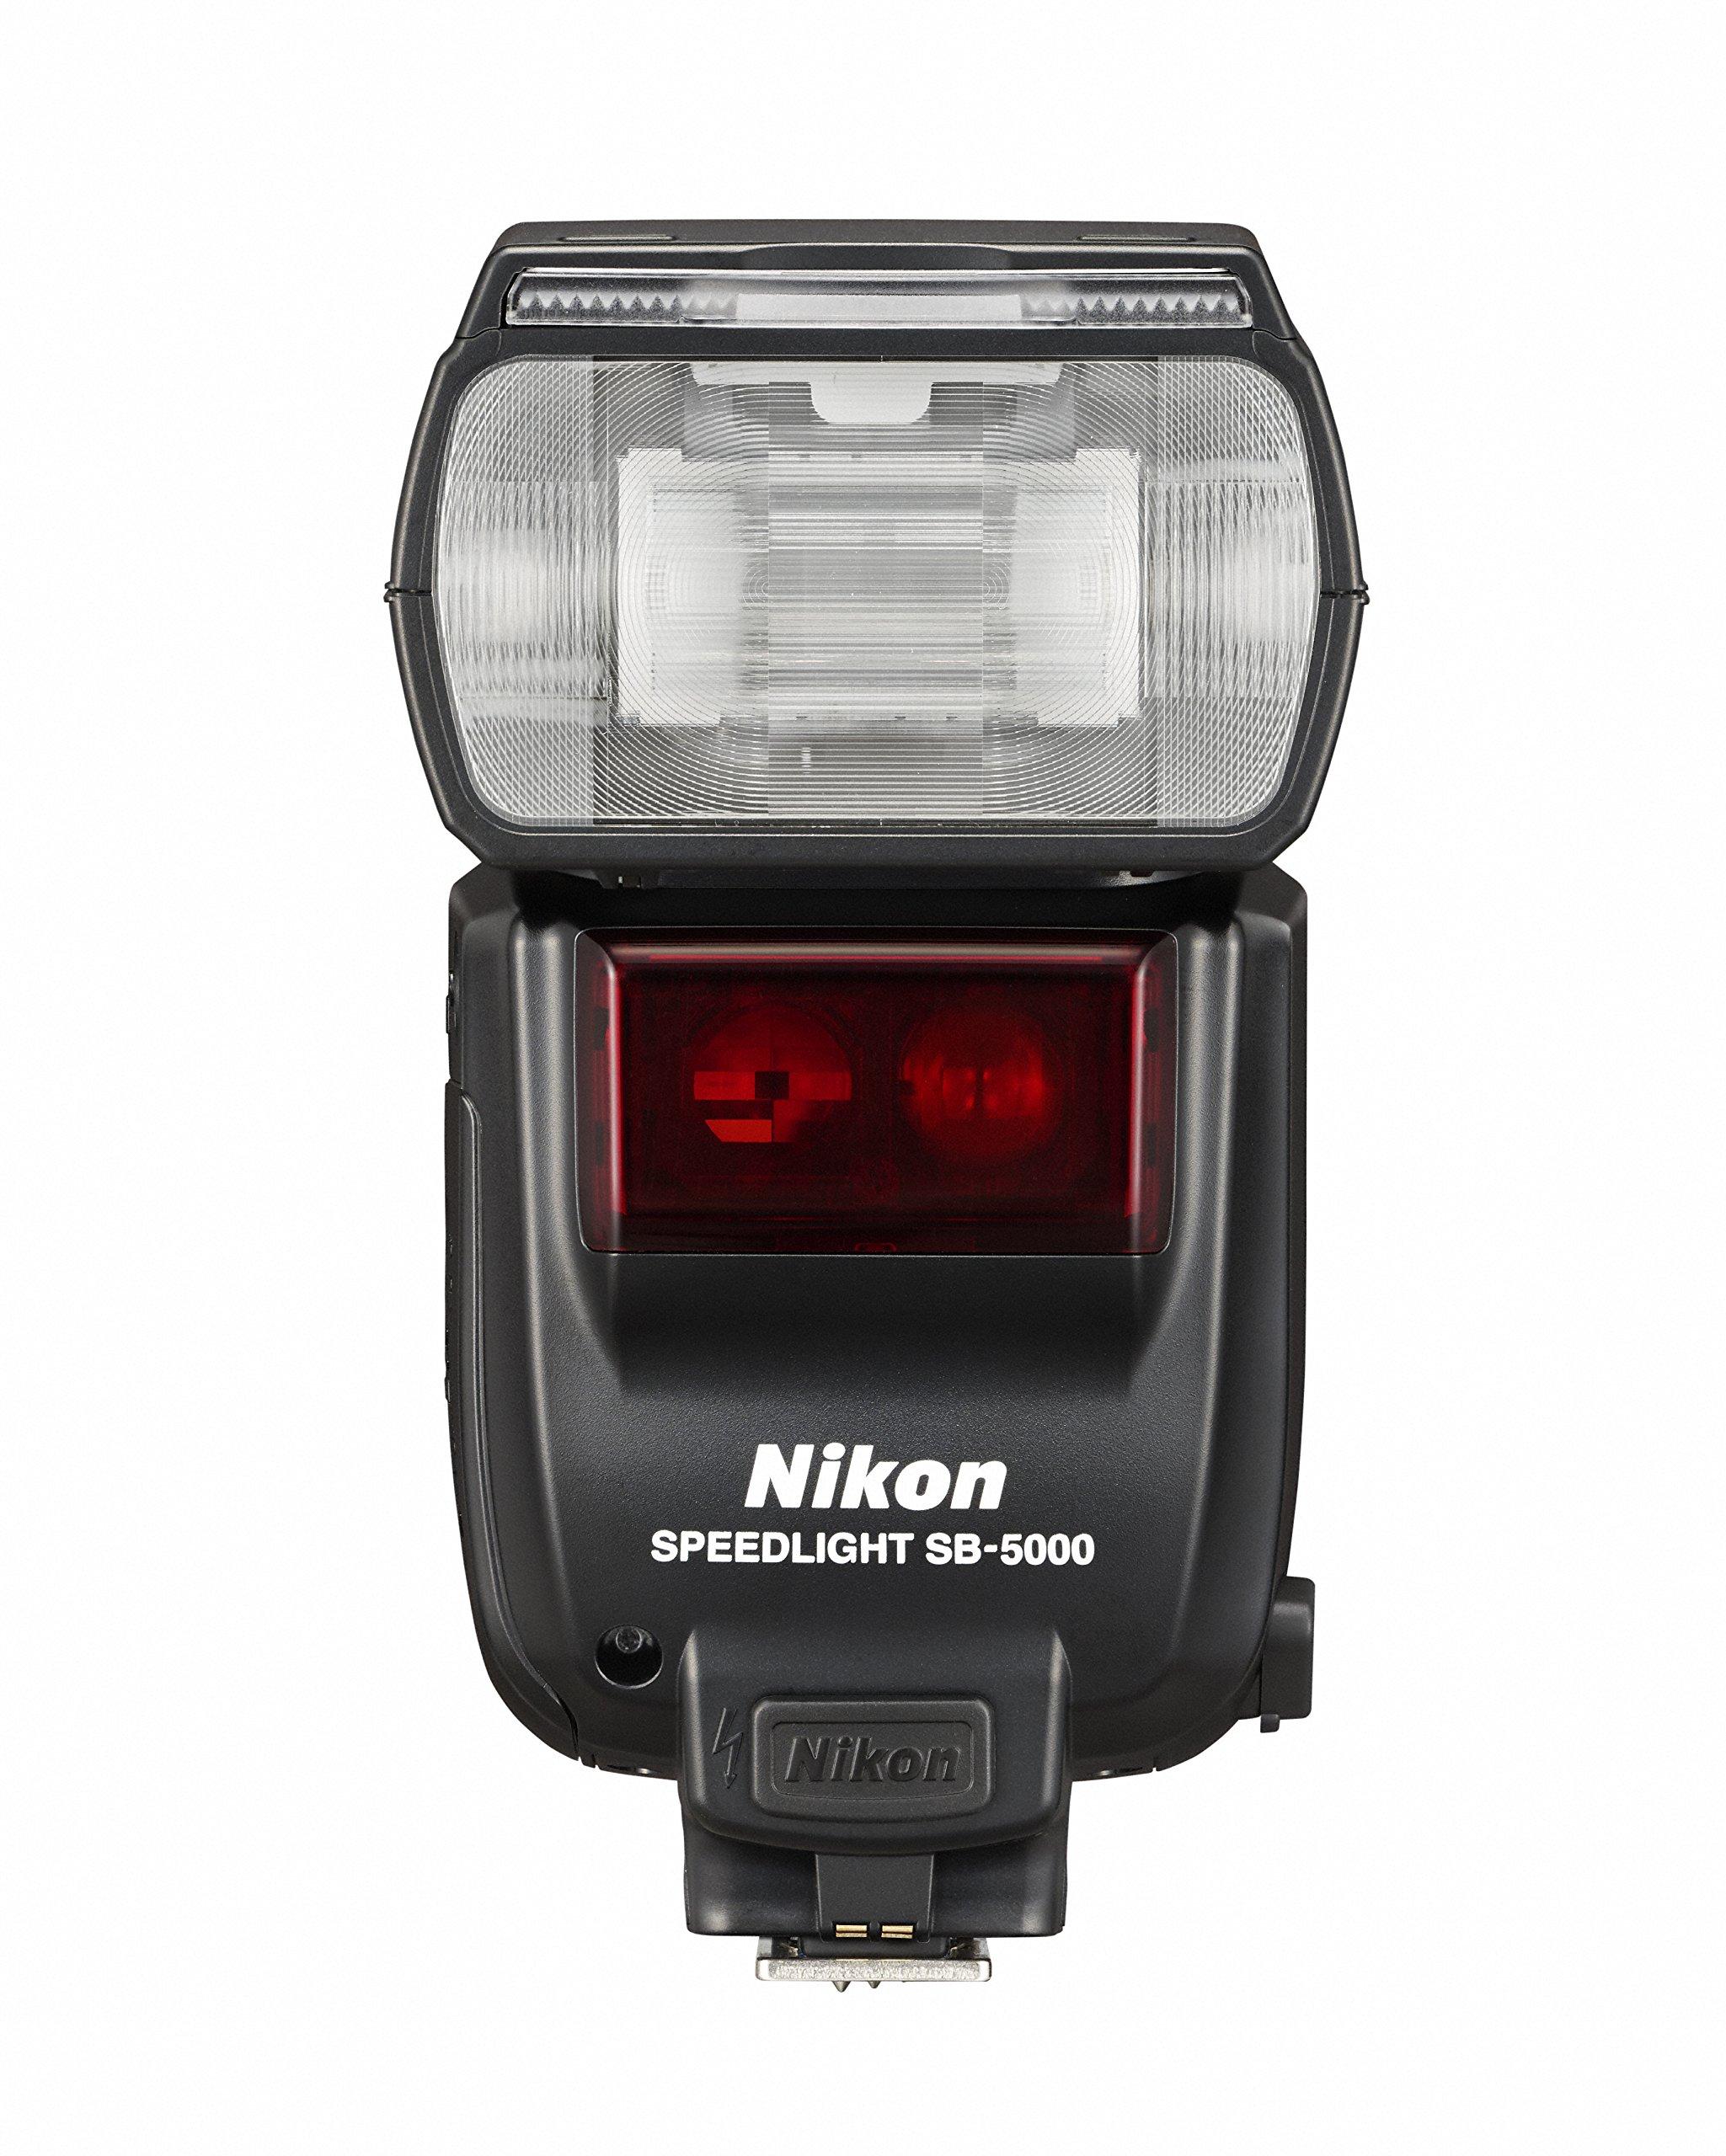 Nikon Flash Speedlight SB-5000--(Japan Import-No Warranty)